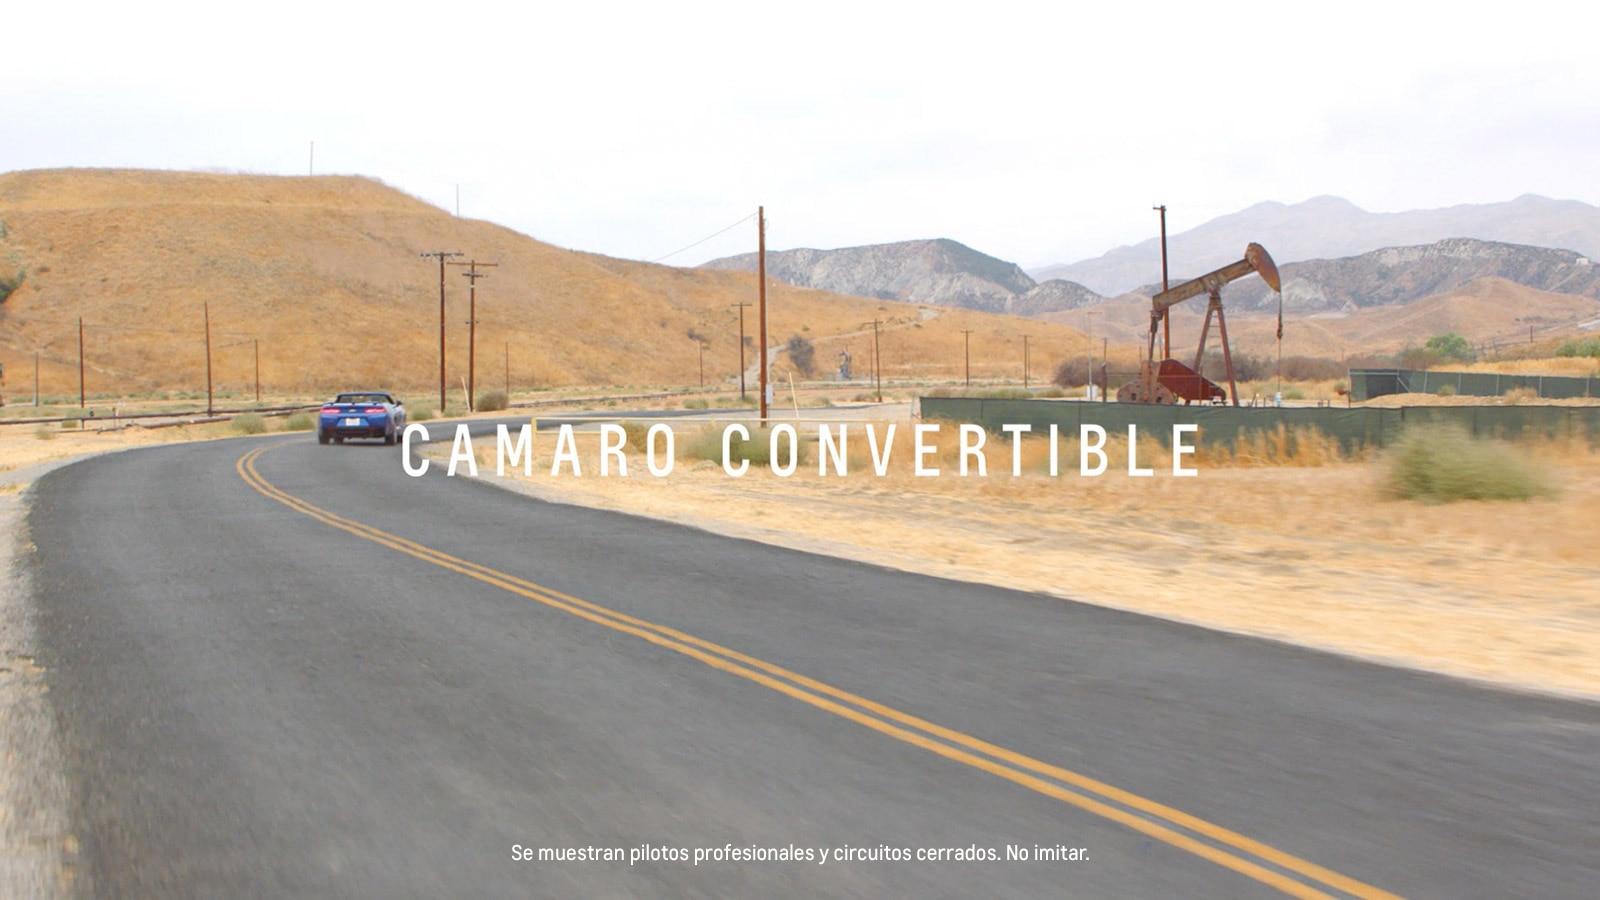 Auto deportivo Camaro 2018: Convertible